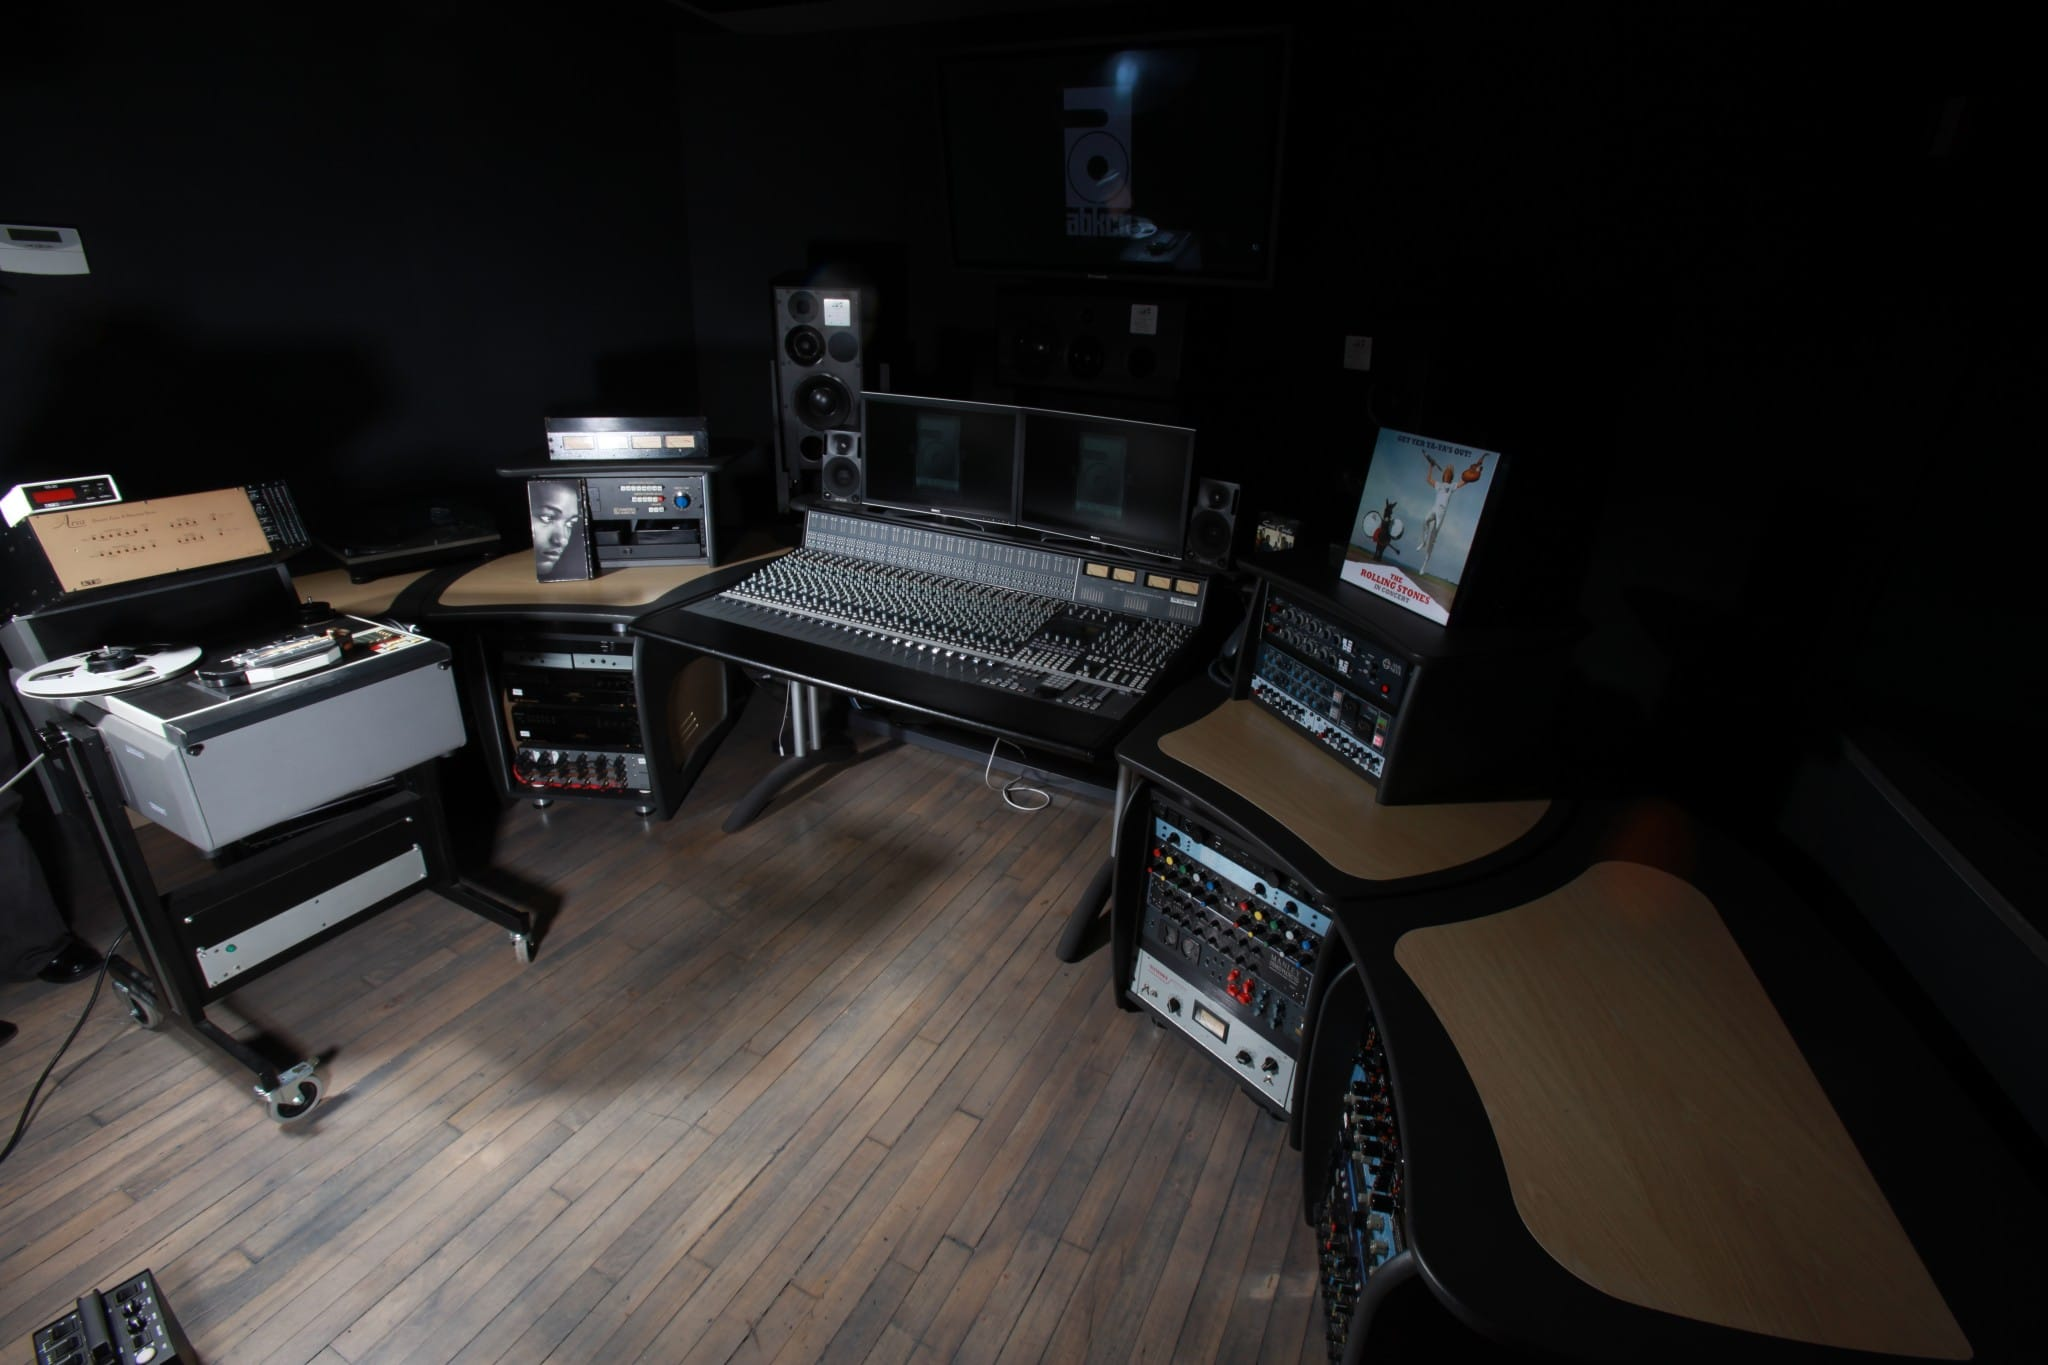 abkco-studio-wide-shot-1